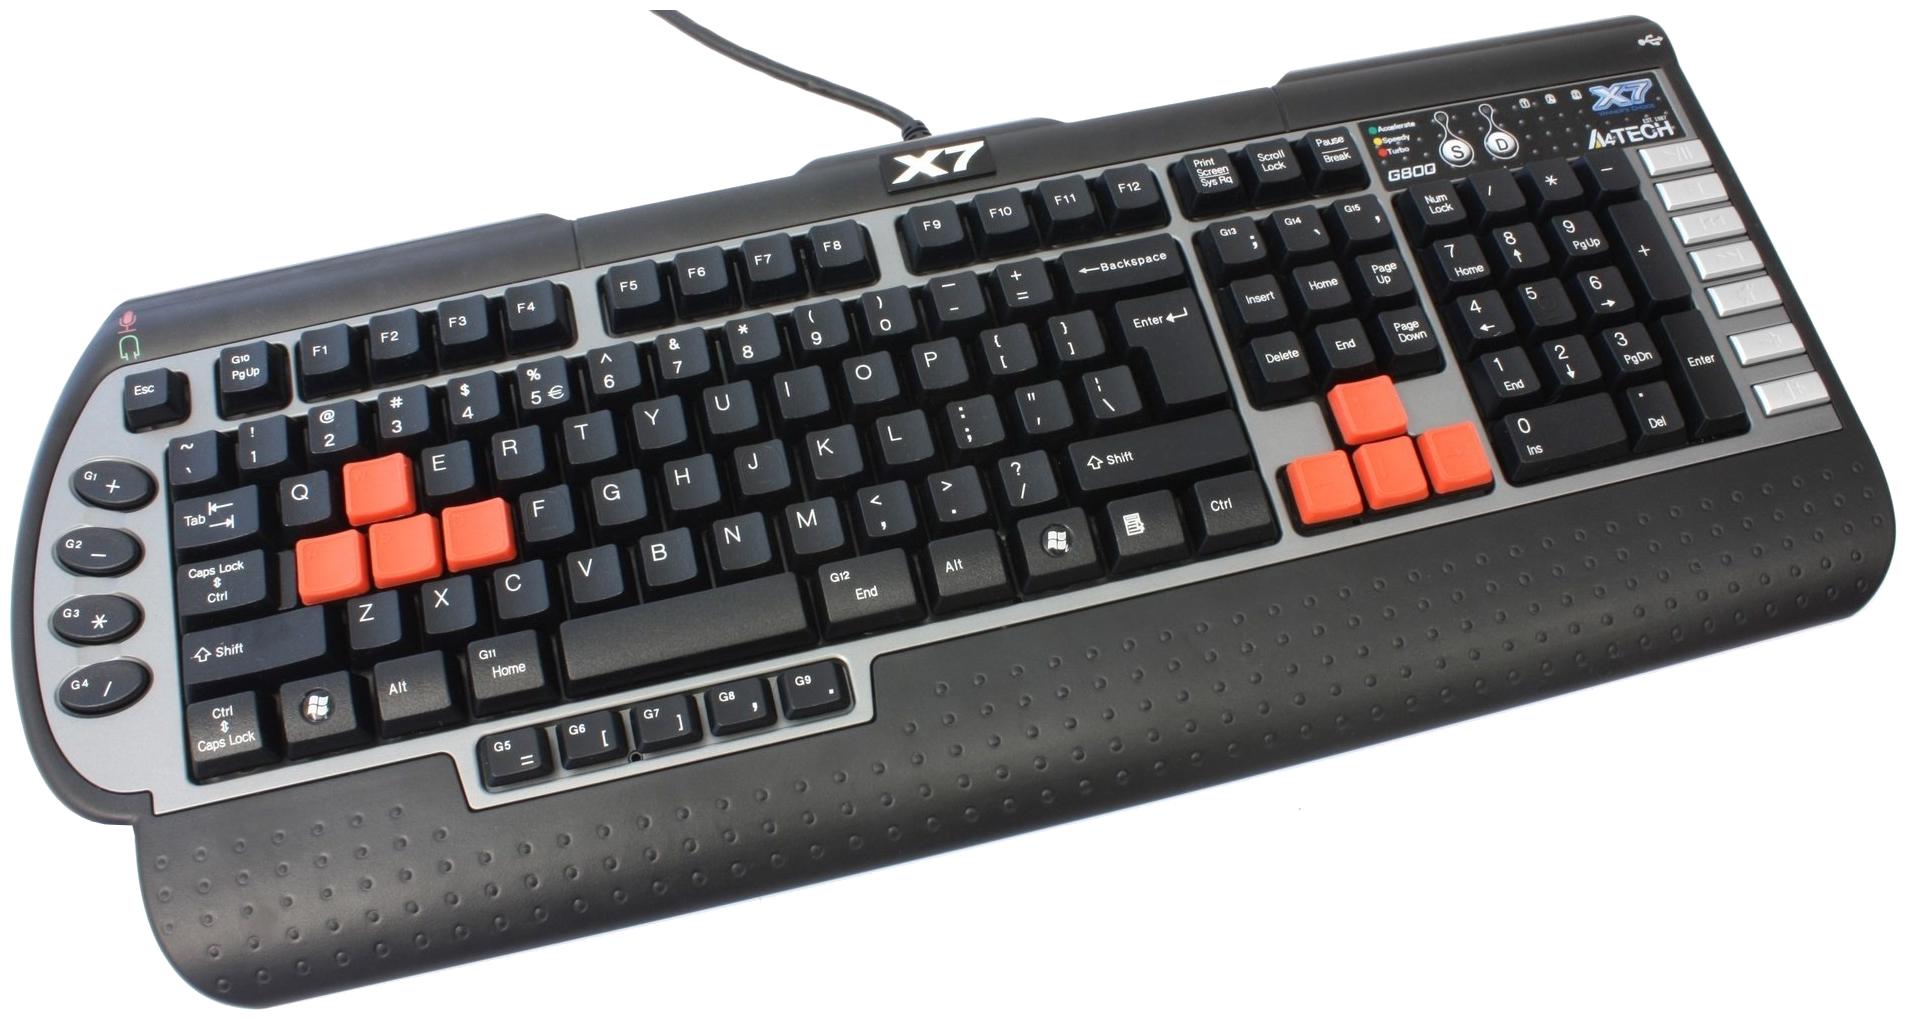 Игровая клавиатура A4Tech X7-G800MU Grey/Black